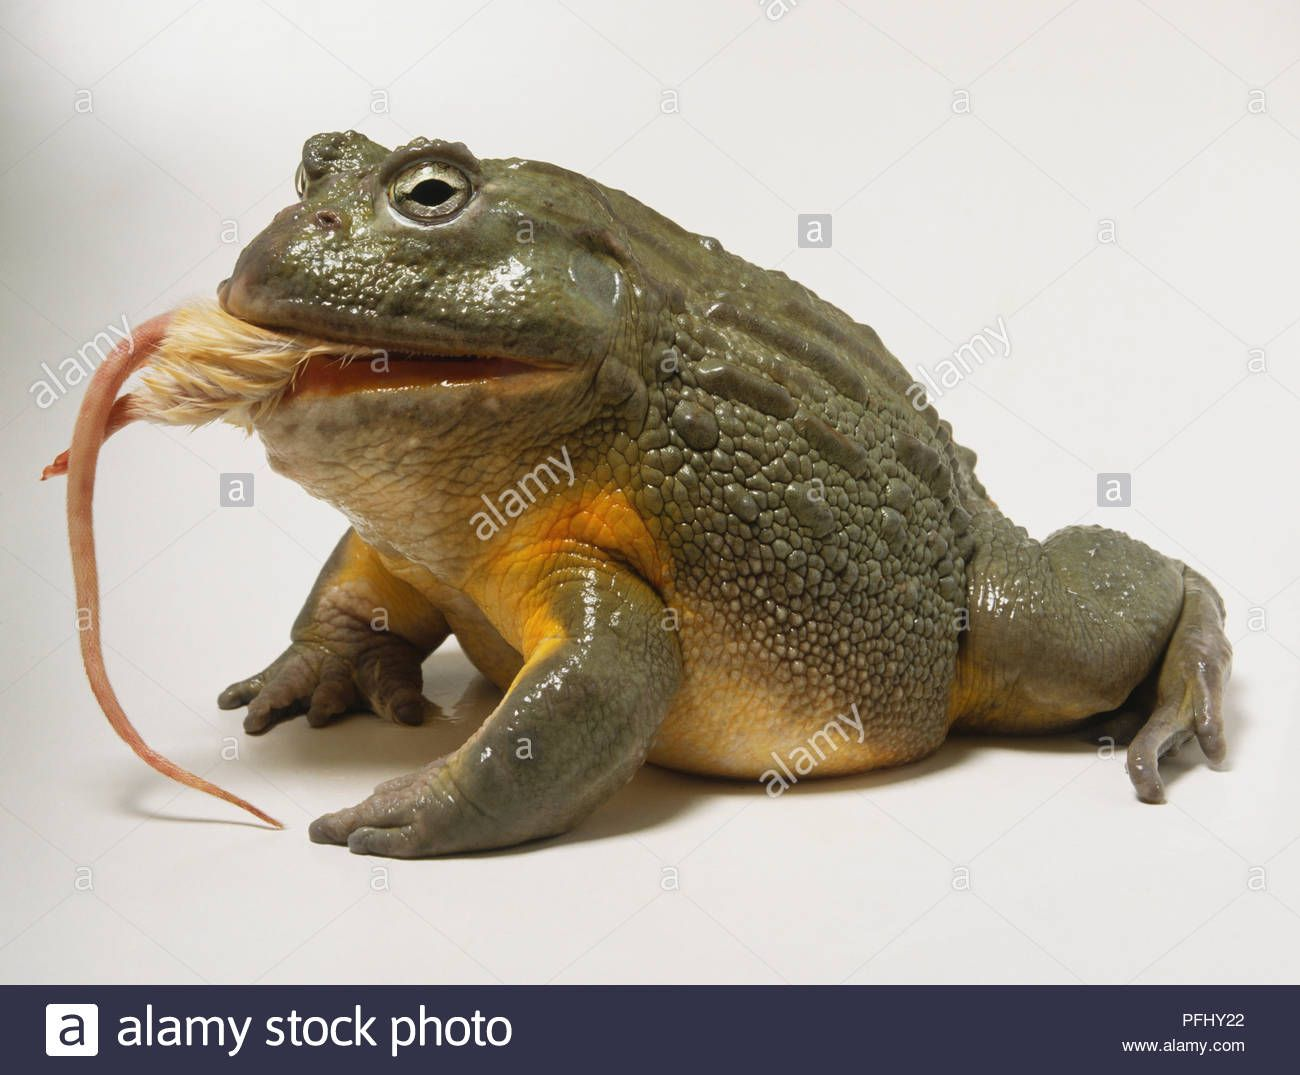 「African Bullfrog」的圖片搜尋結果 African bullfrog, Frog, Toad